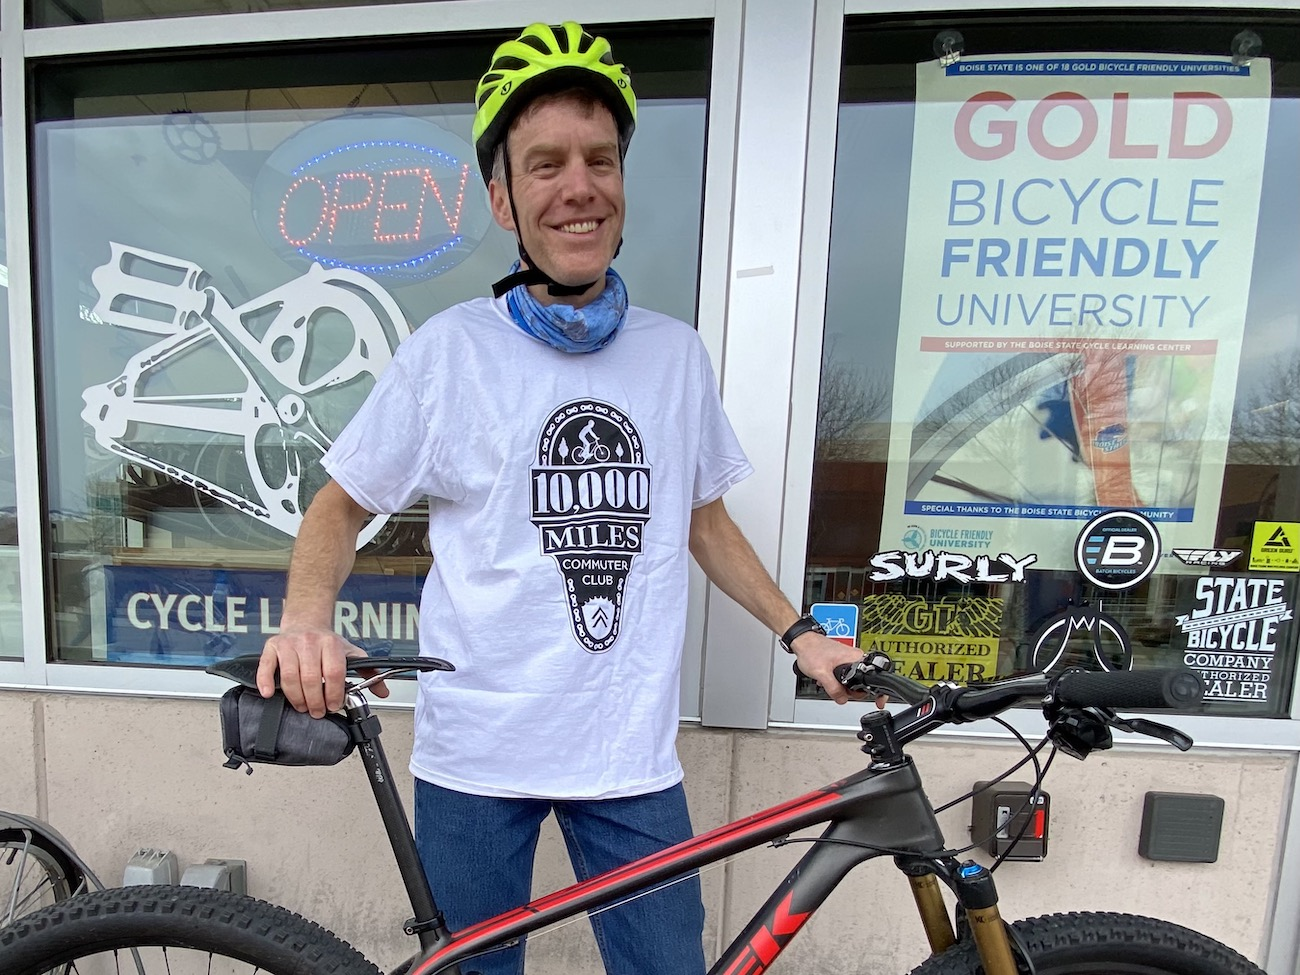 Paul Davis and his bicycle